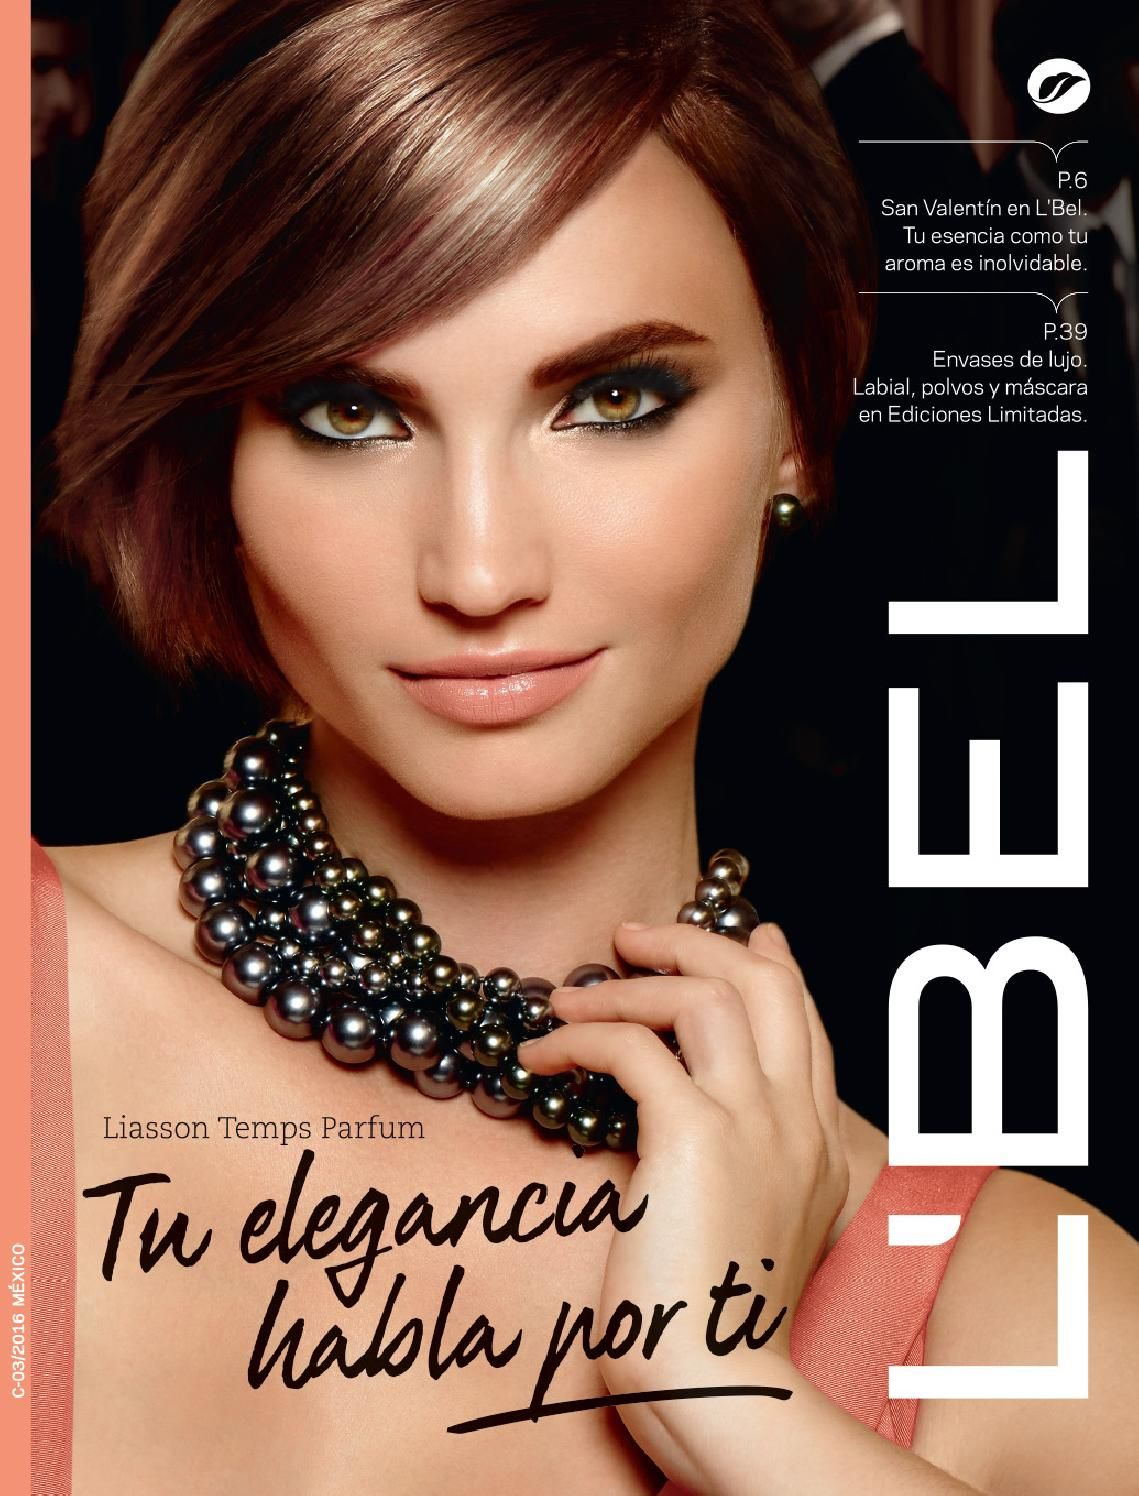 Catálogo L'bel México C03 (With images) Renew skin, Skin